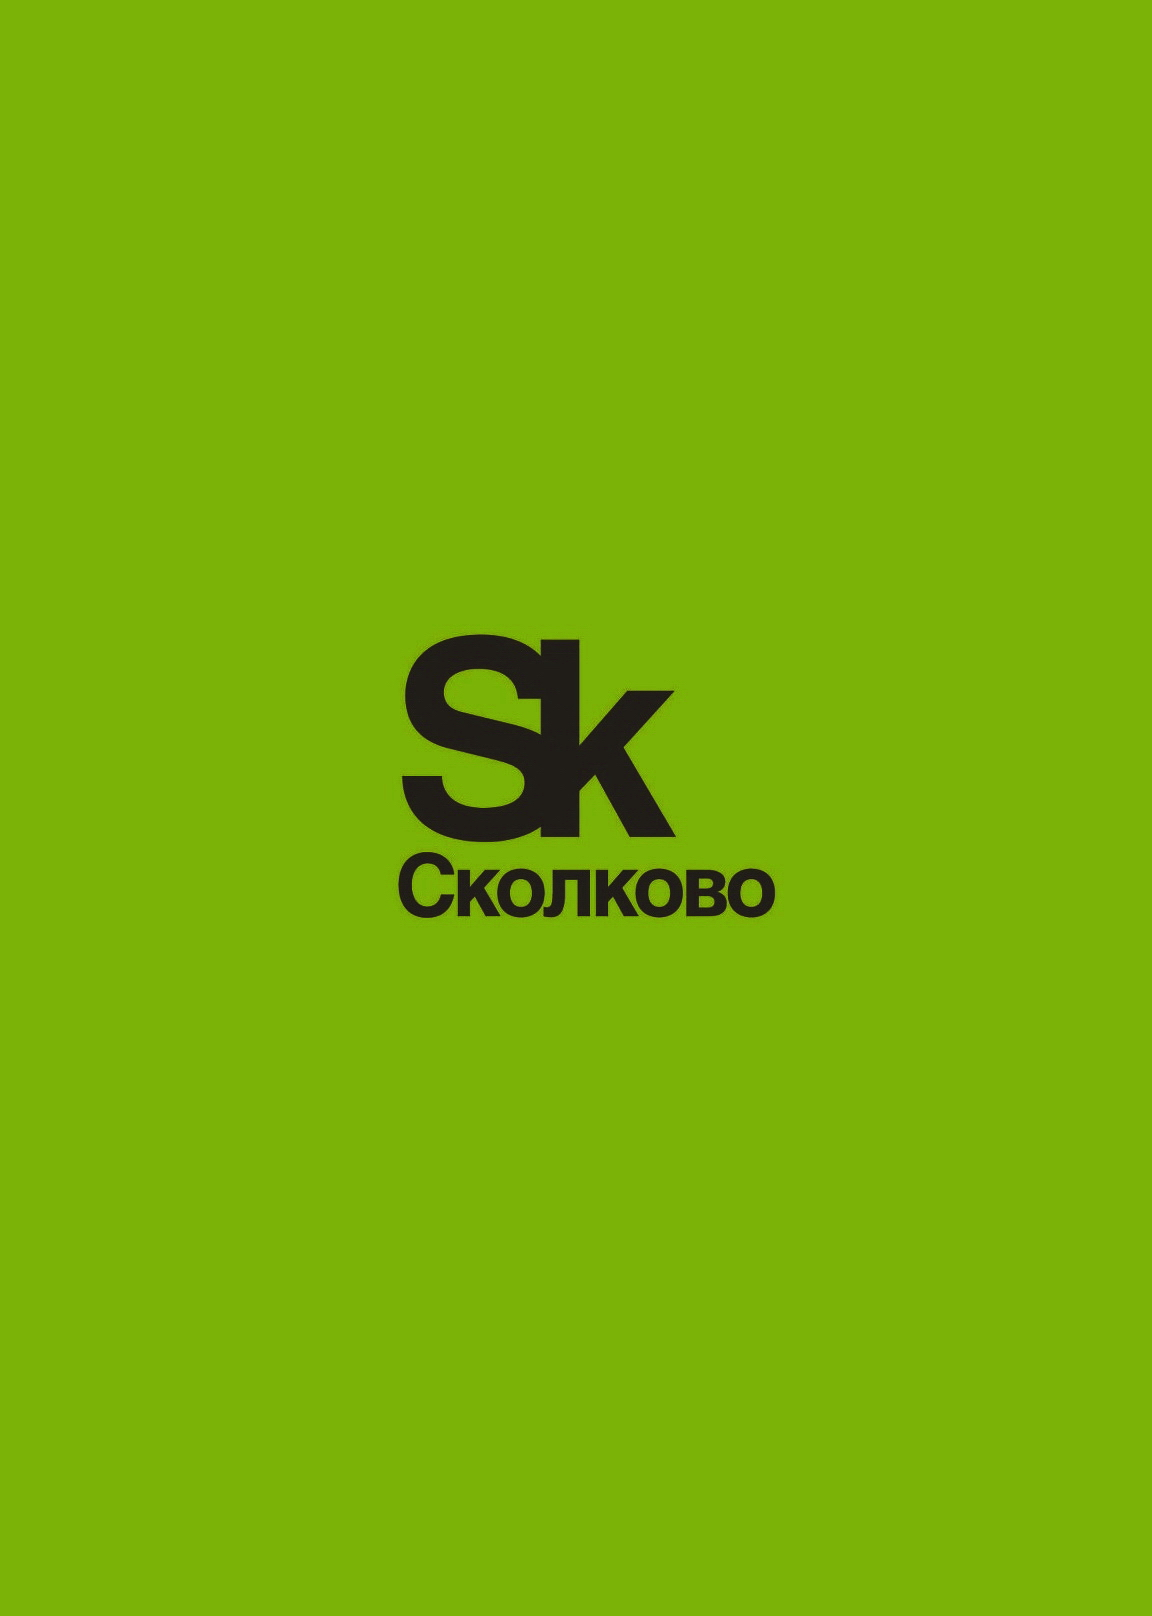 SKOLKOVO / SMARTTRACK